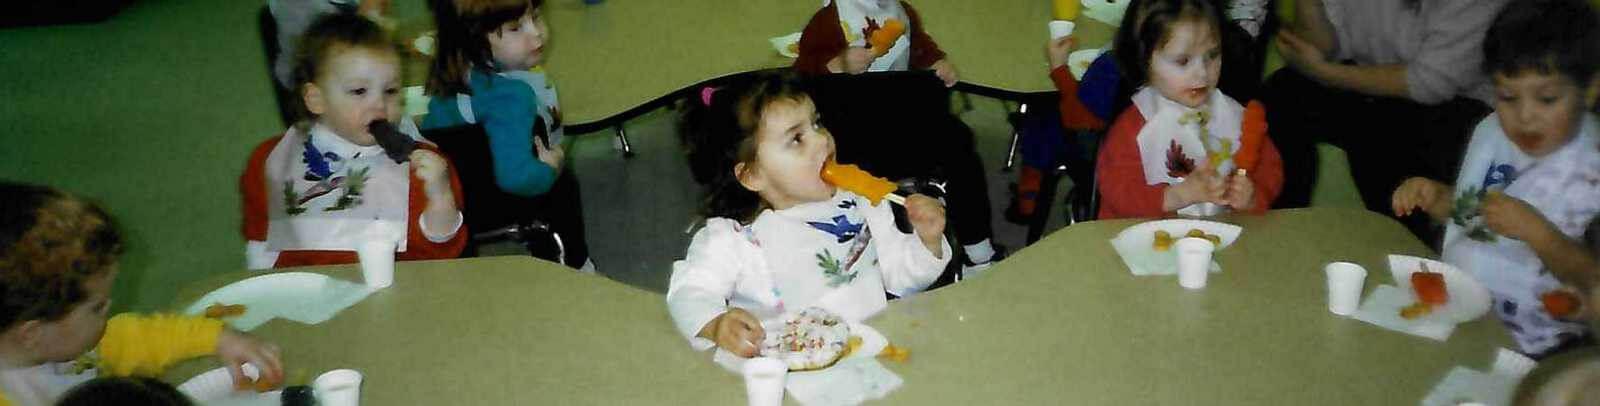 30 years kids eating2-banner.jpeg